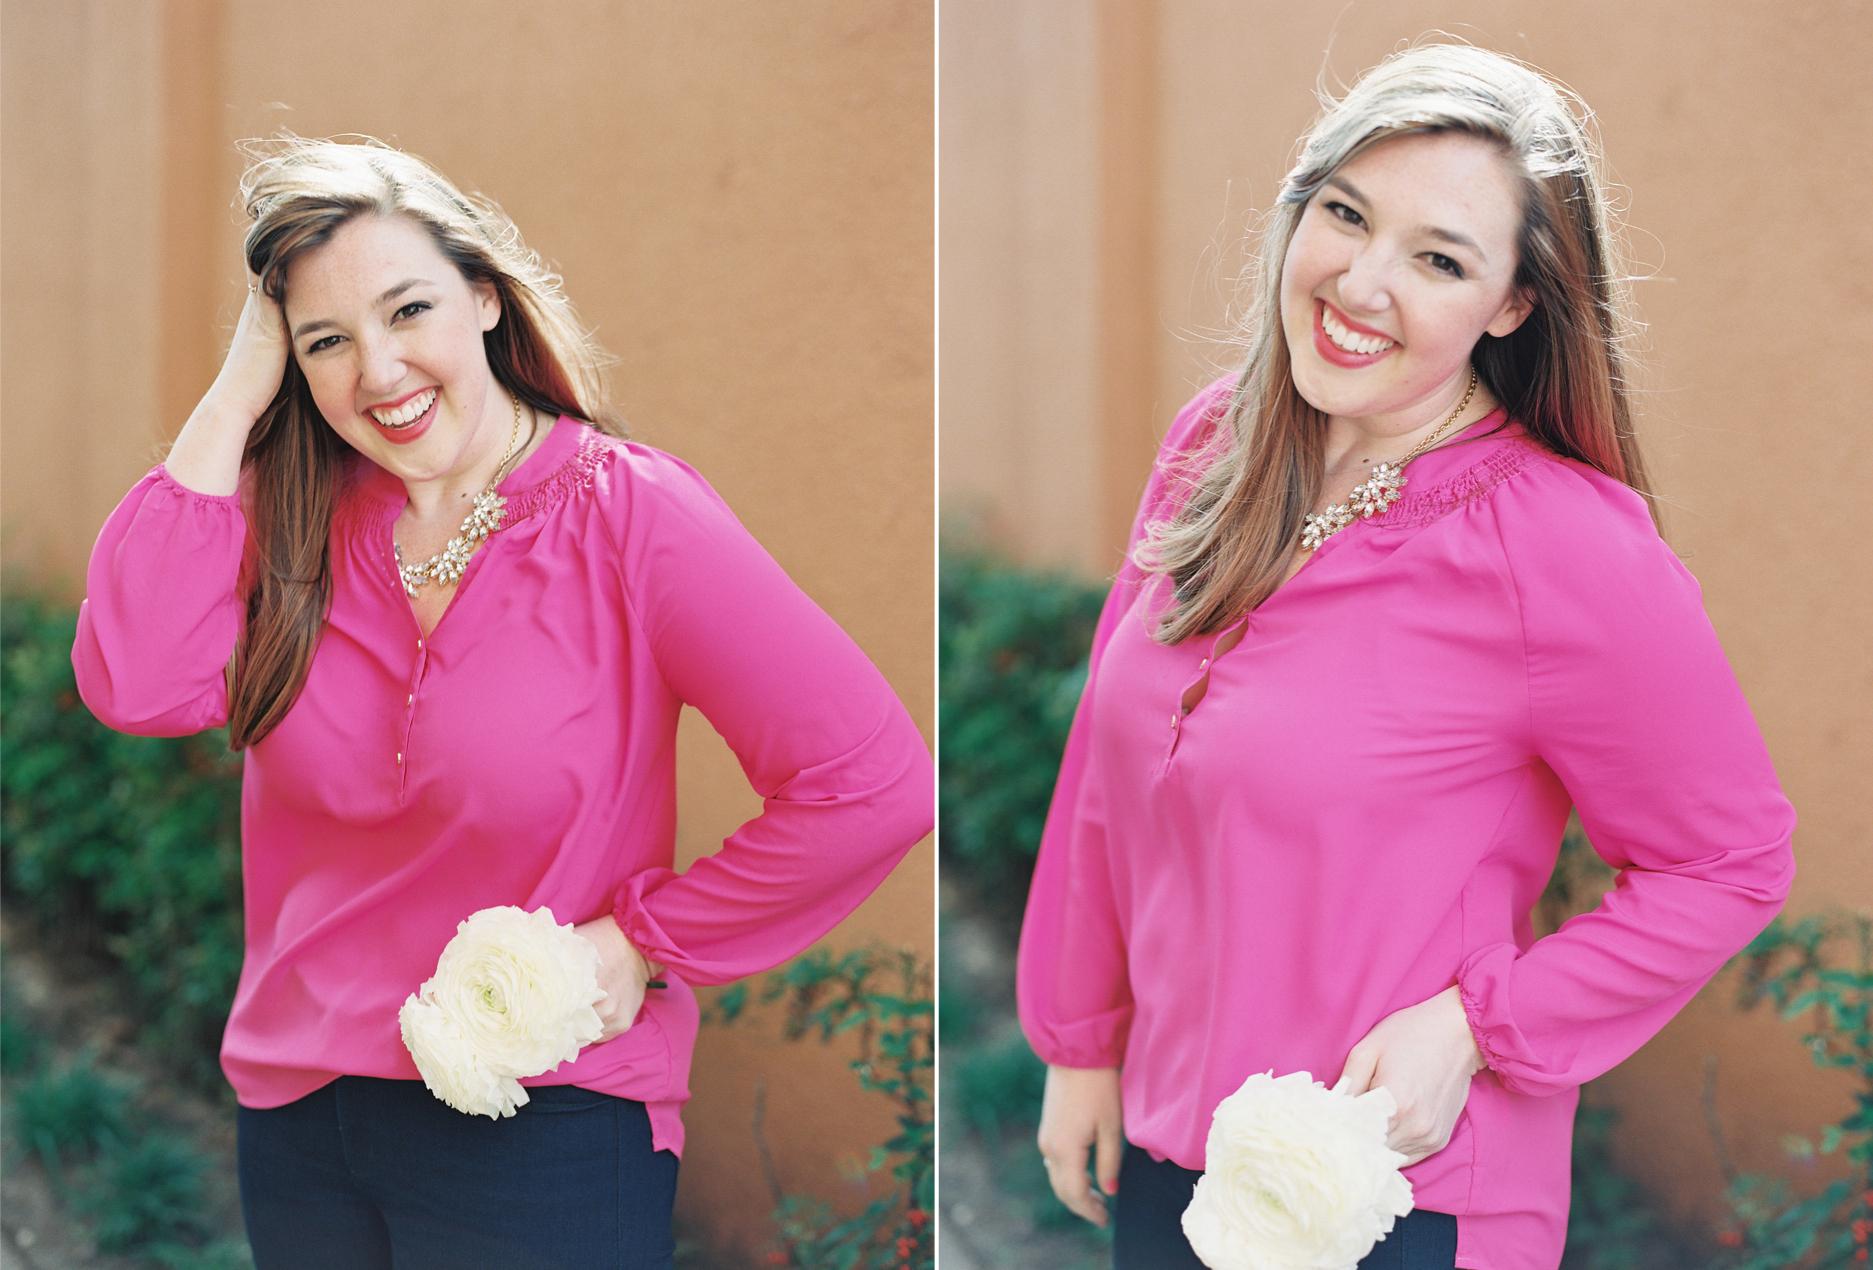 The Graceful Host - Headshots By Amanda Watson - April 2014